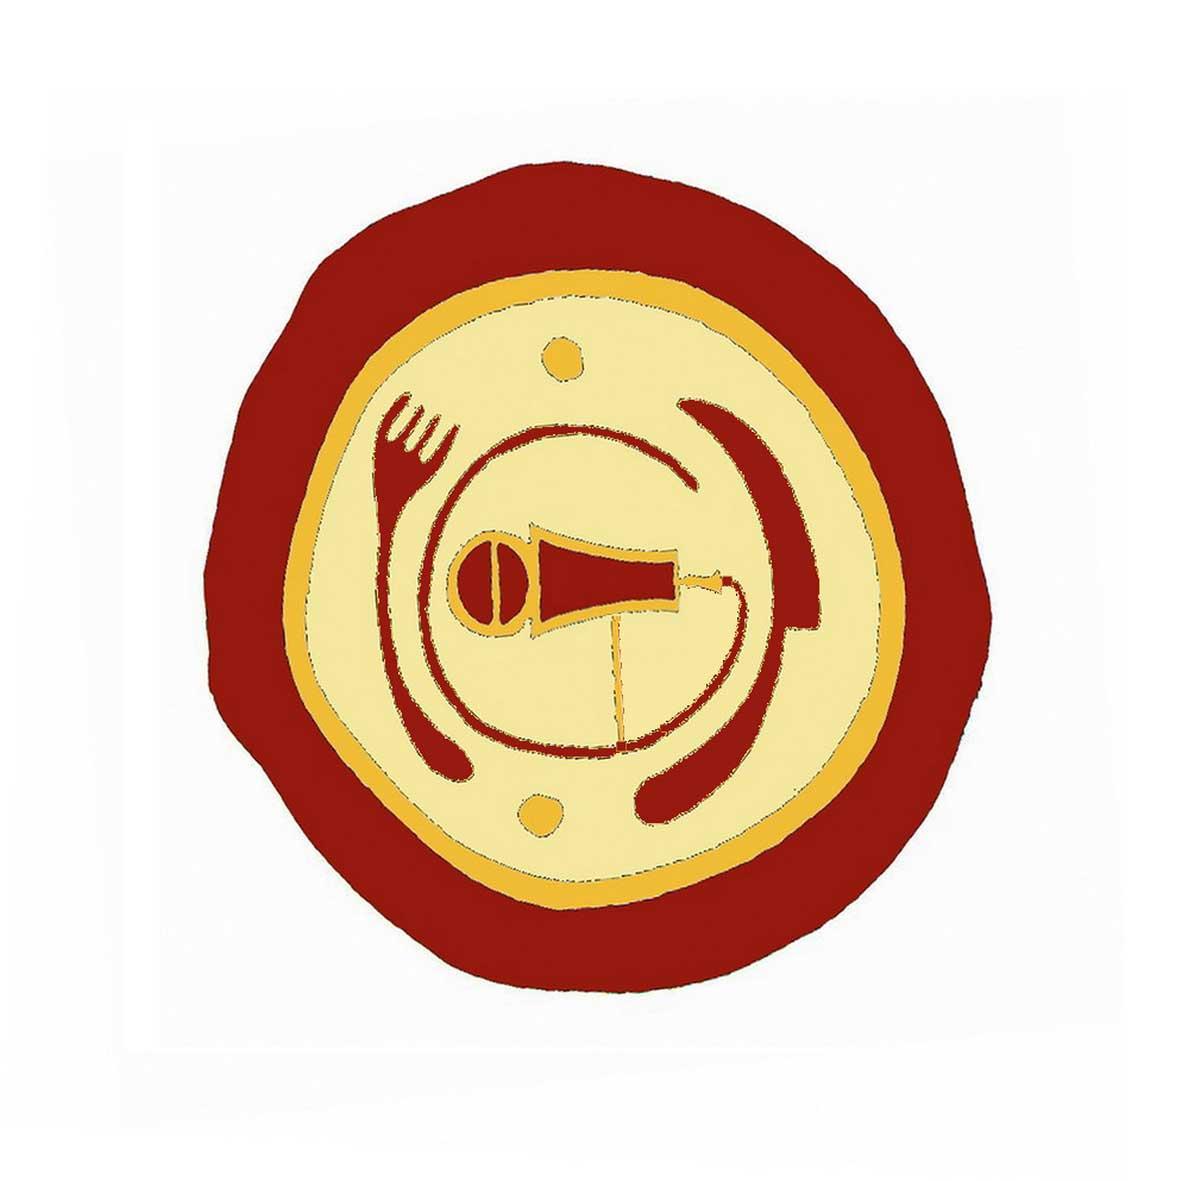 The Symposium of Greek Gastronomy logo.